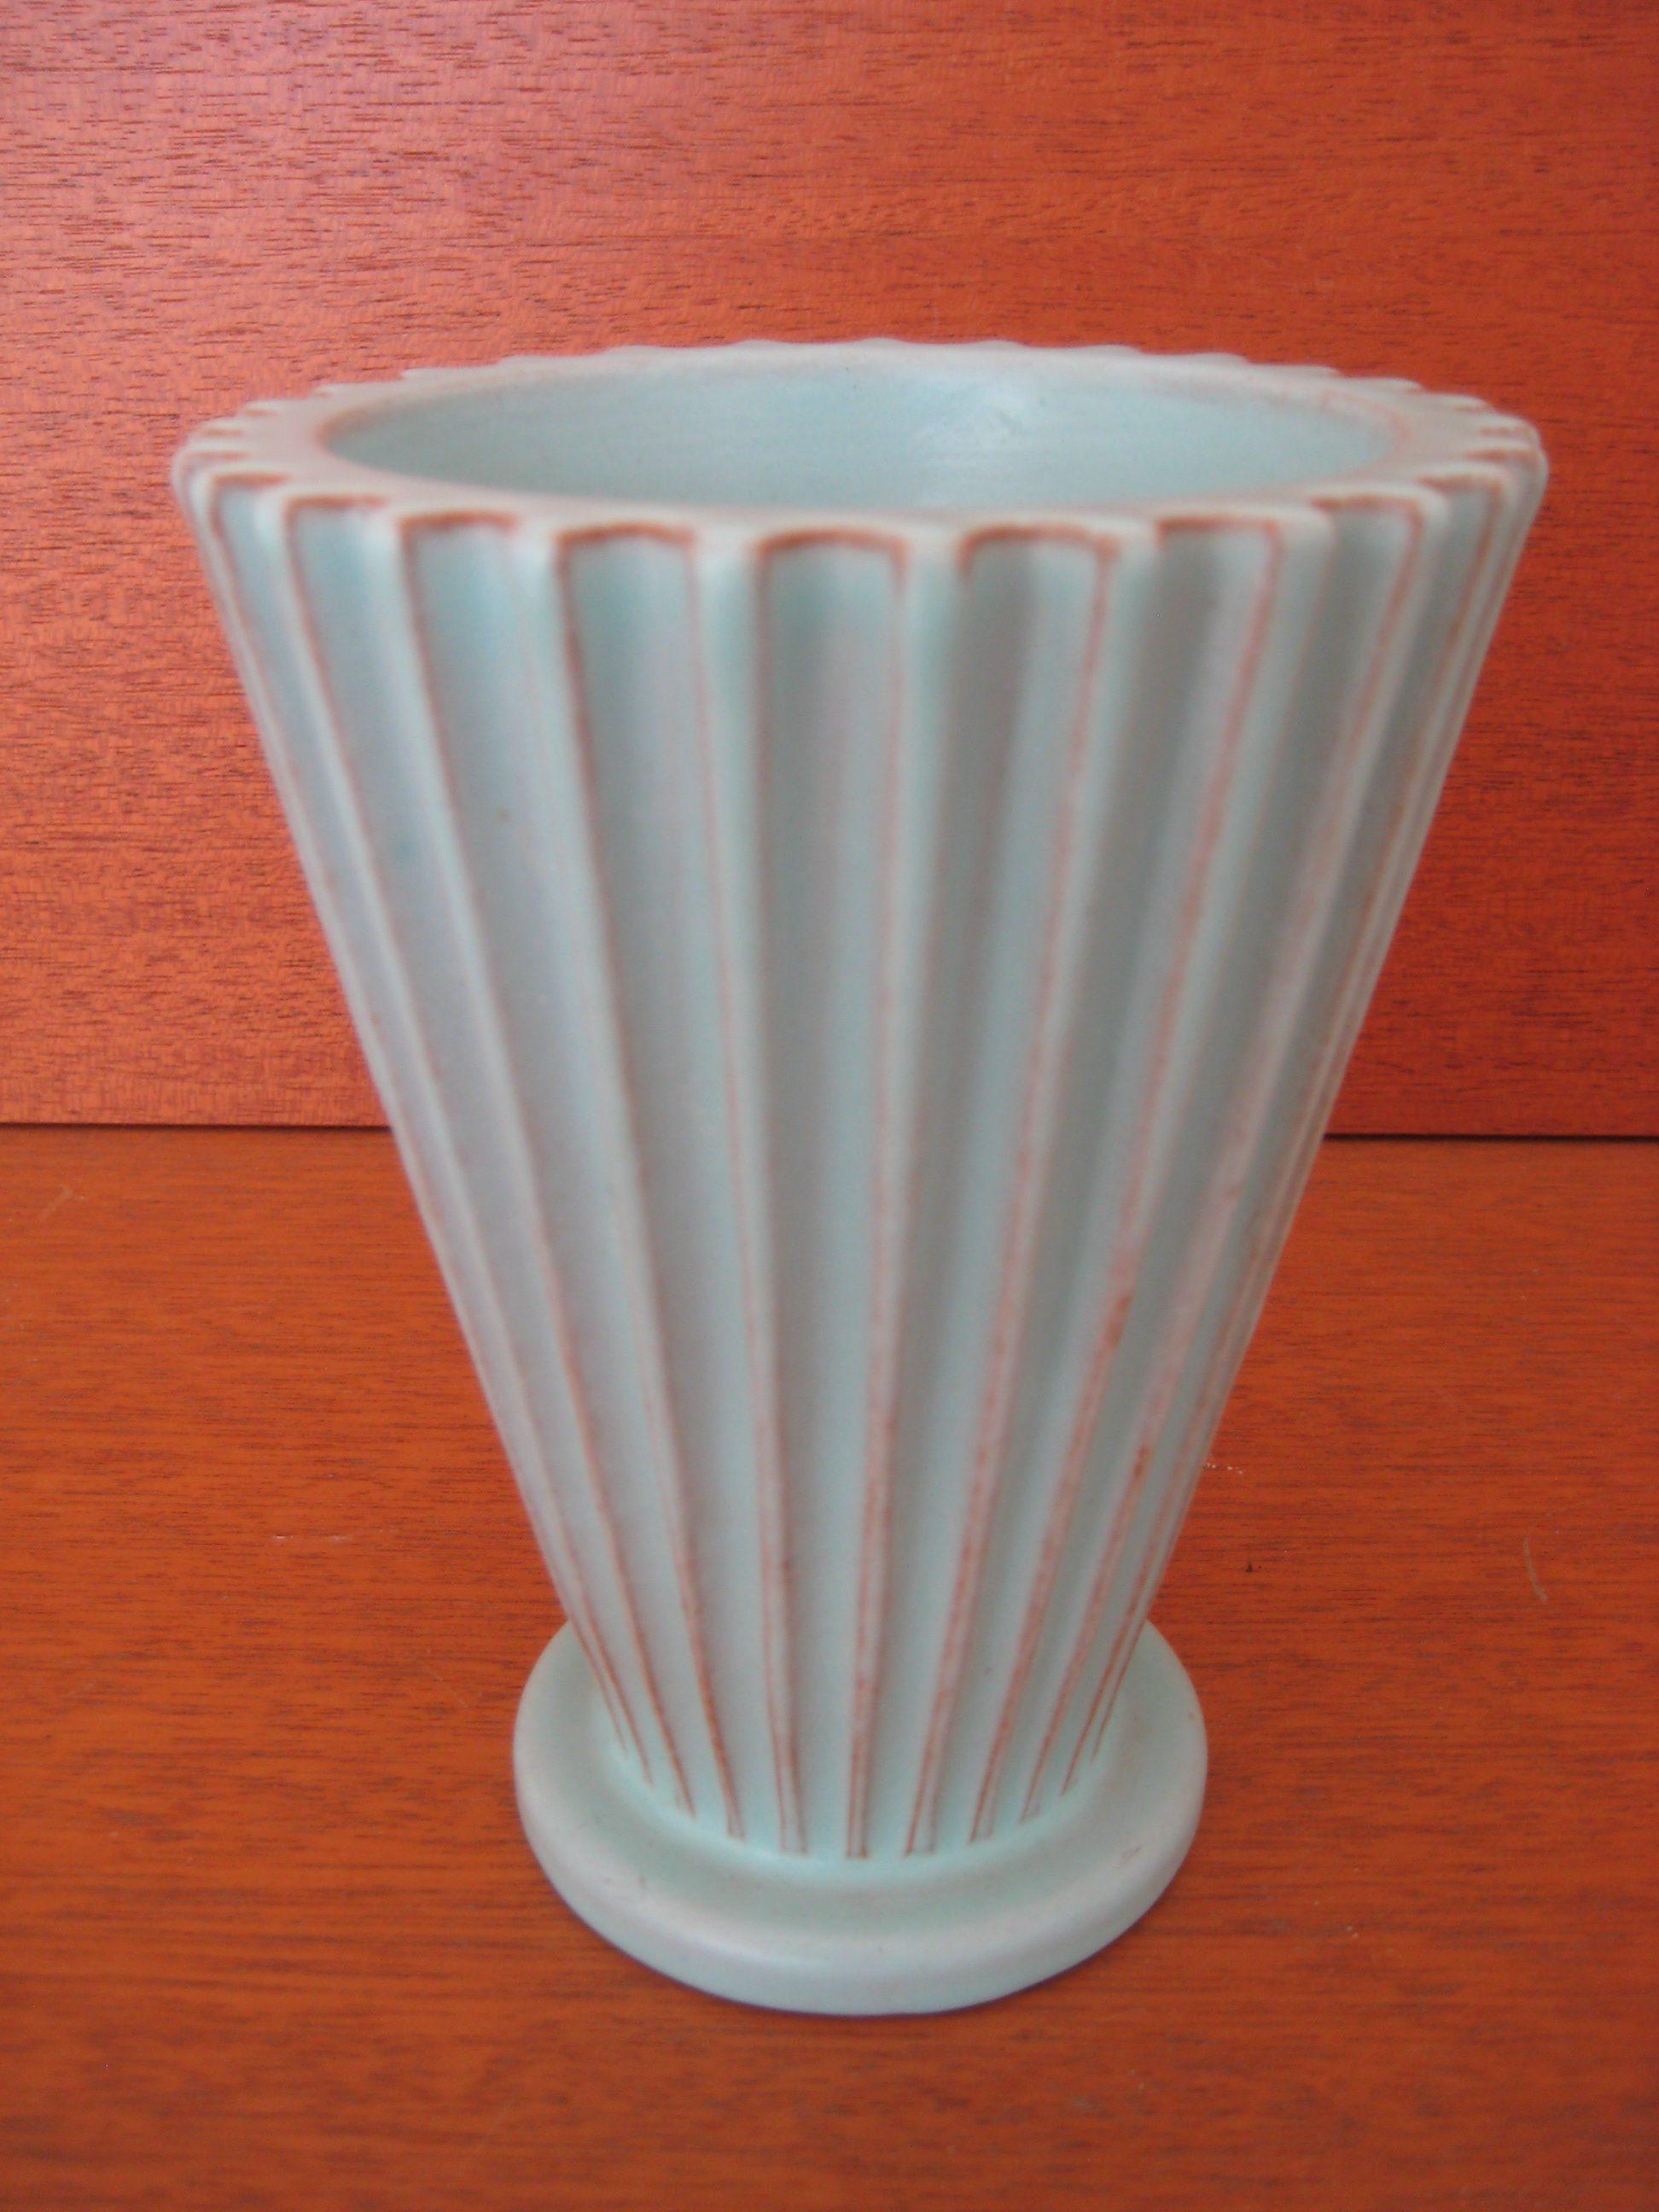 Turkis Schollert vase